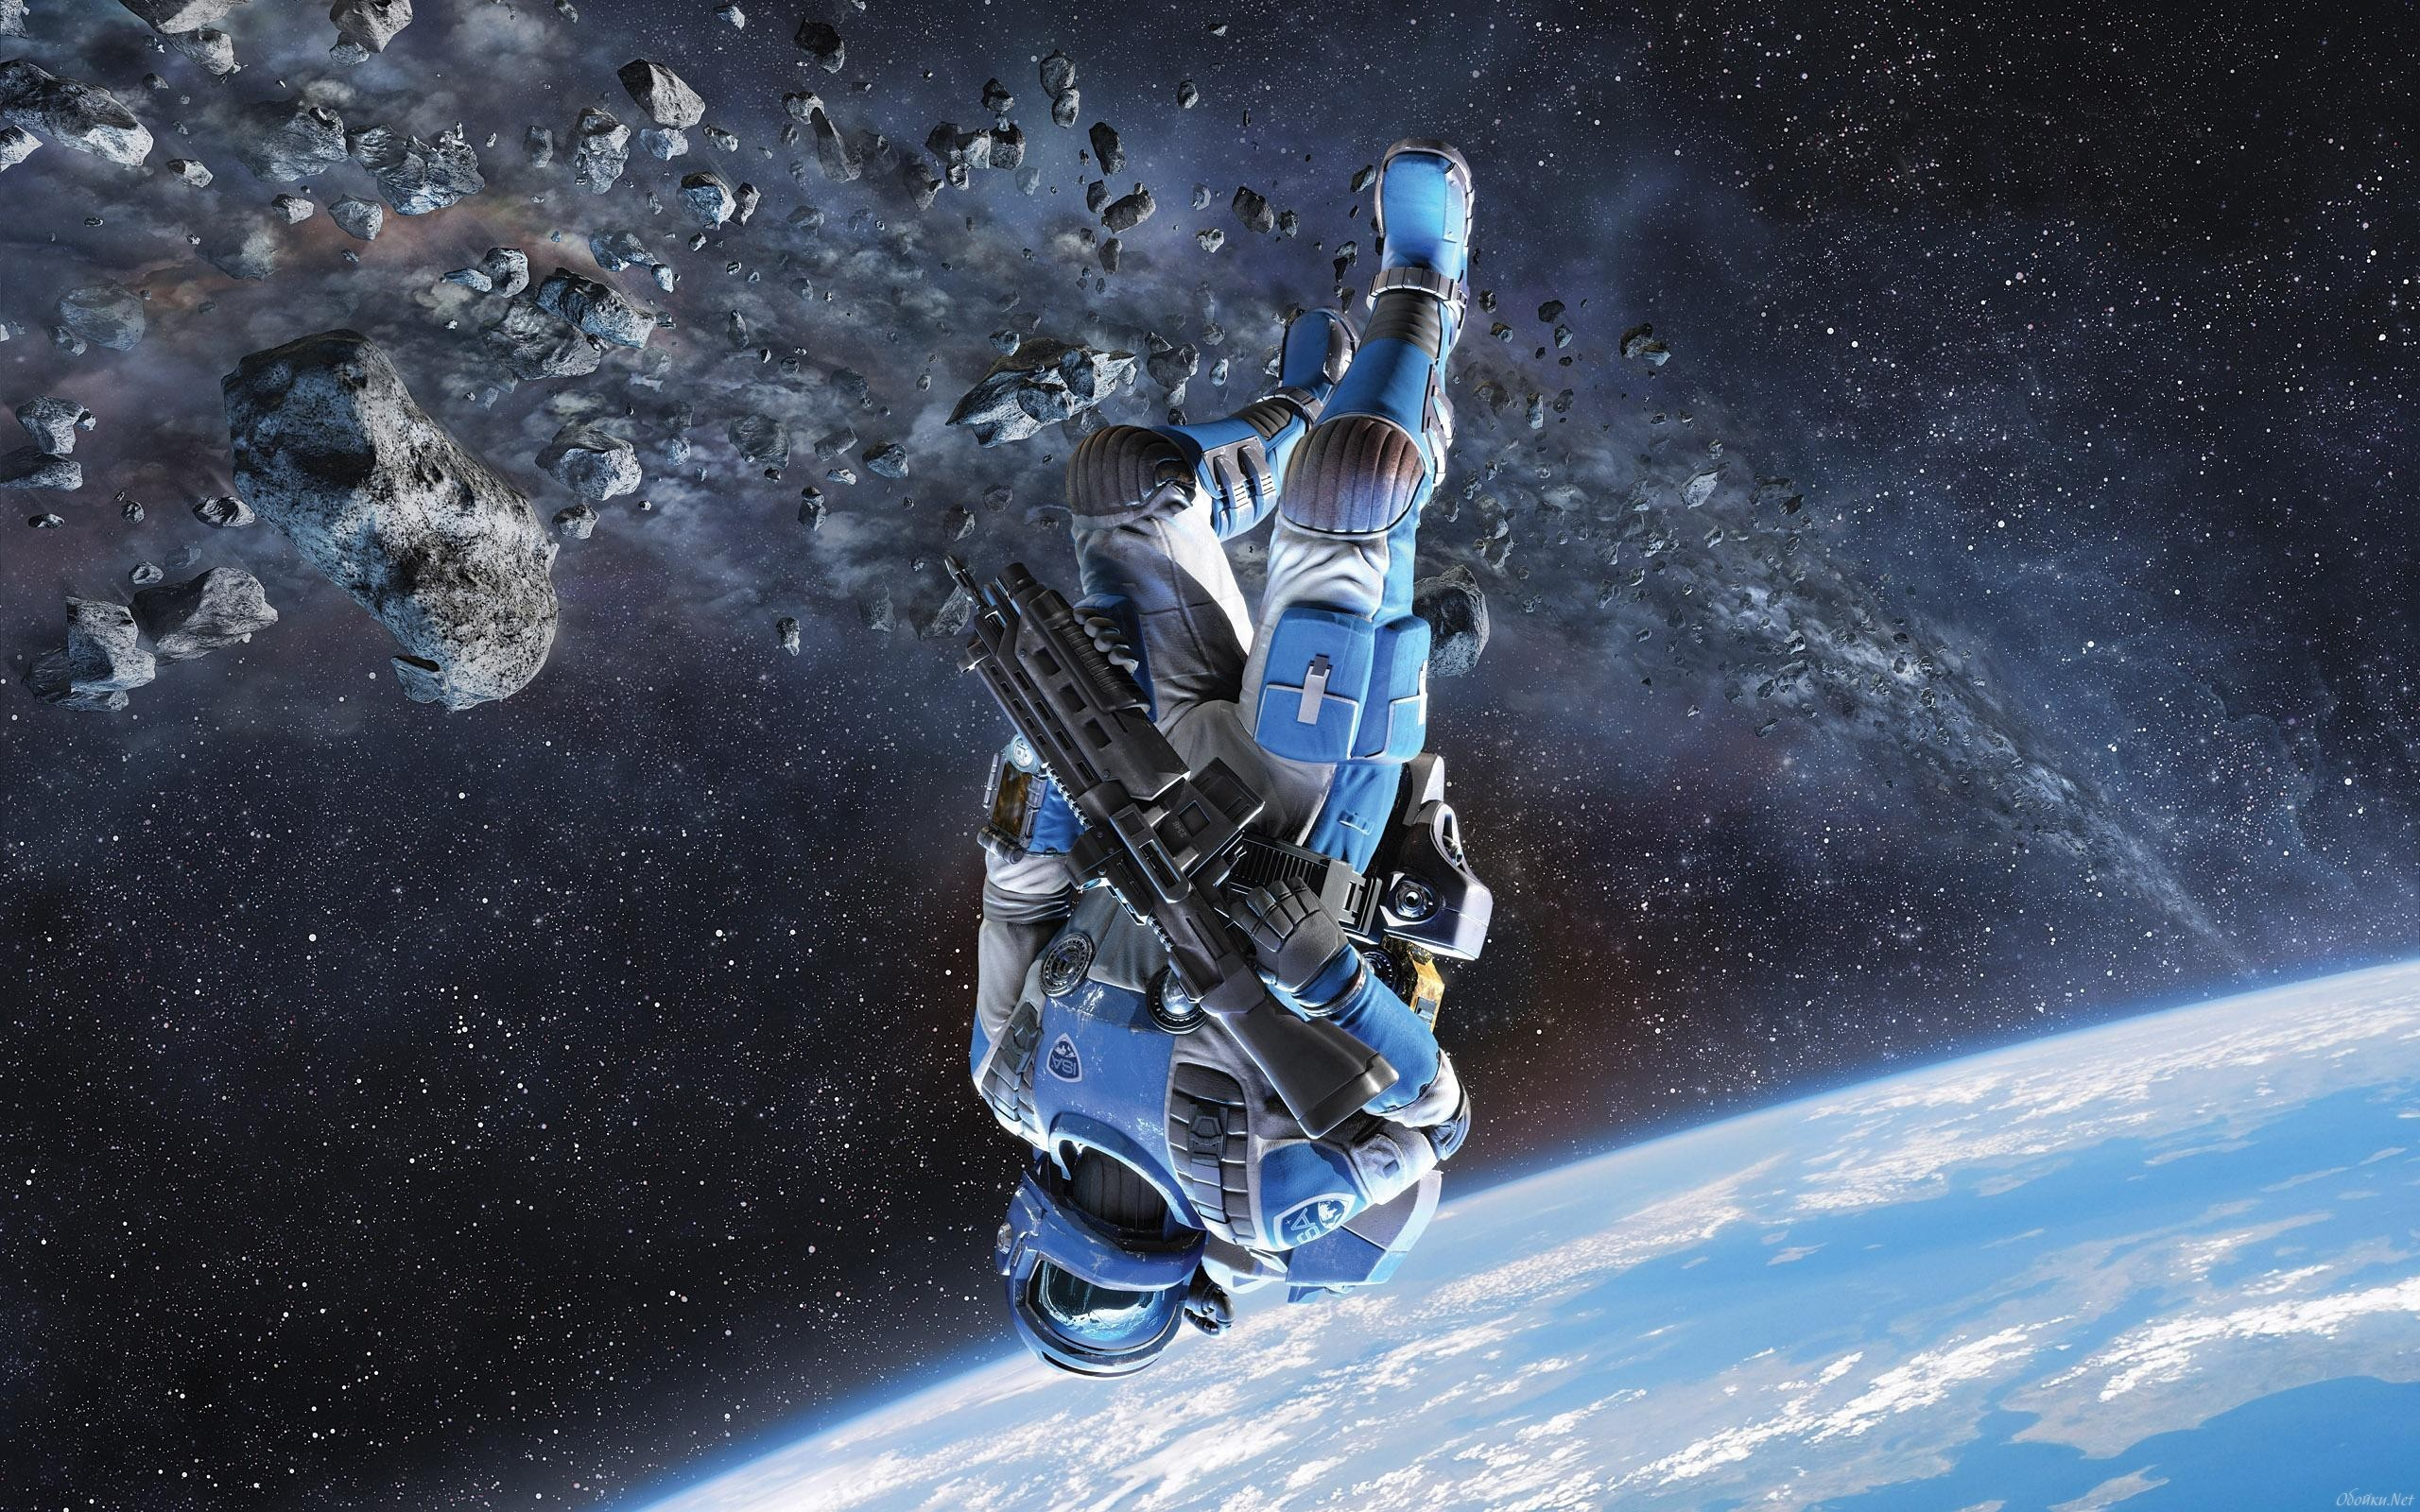 wallpaper.wiki-Astronaut-Photo-Download-Free-PIC-WPD003843-